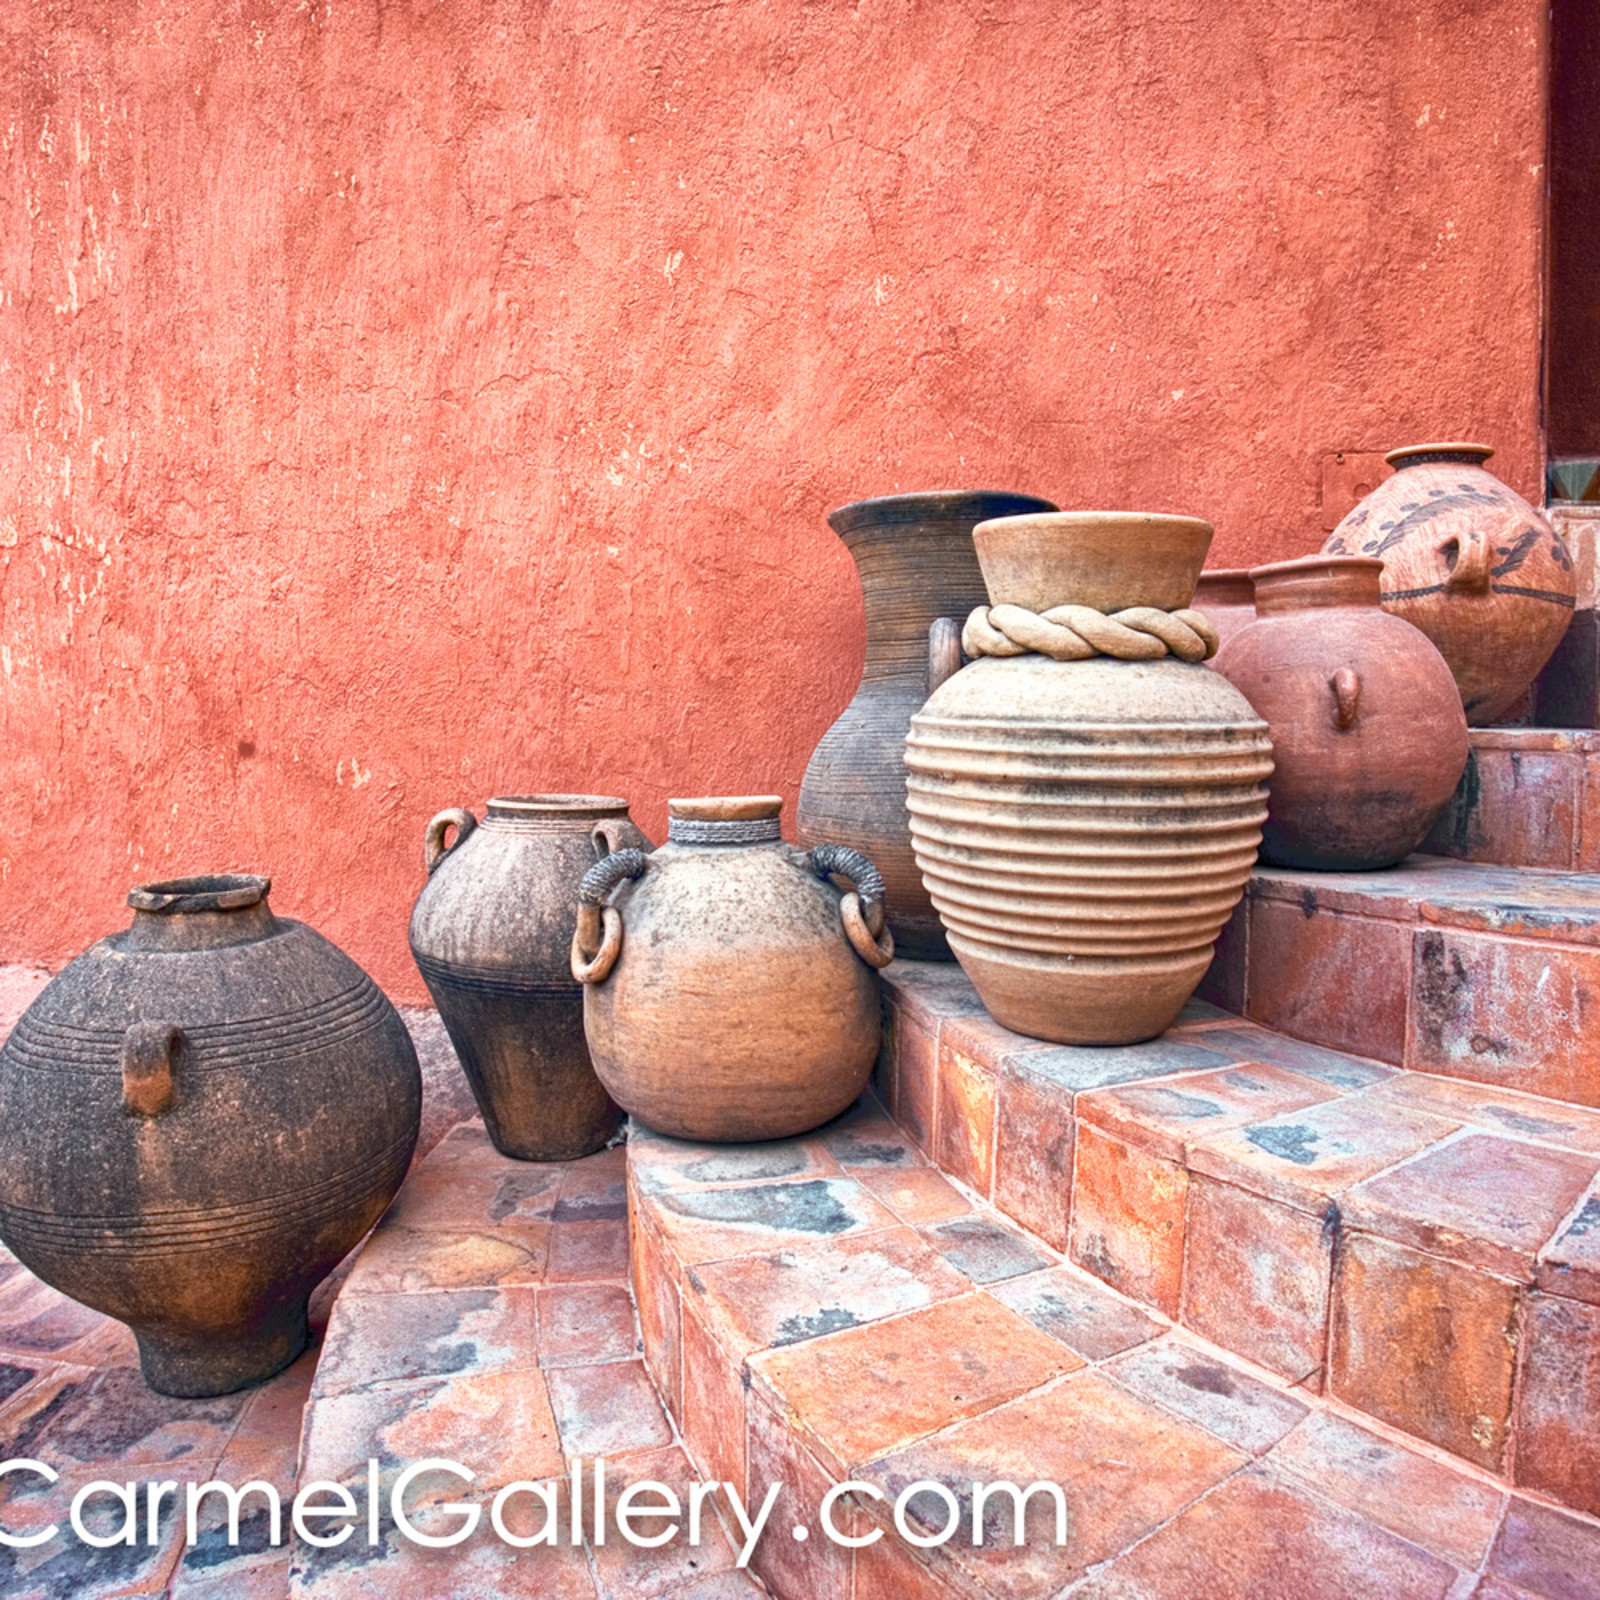 Exposicion de ceramica m7sj6k